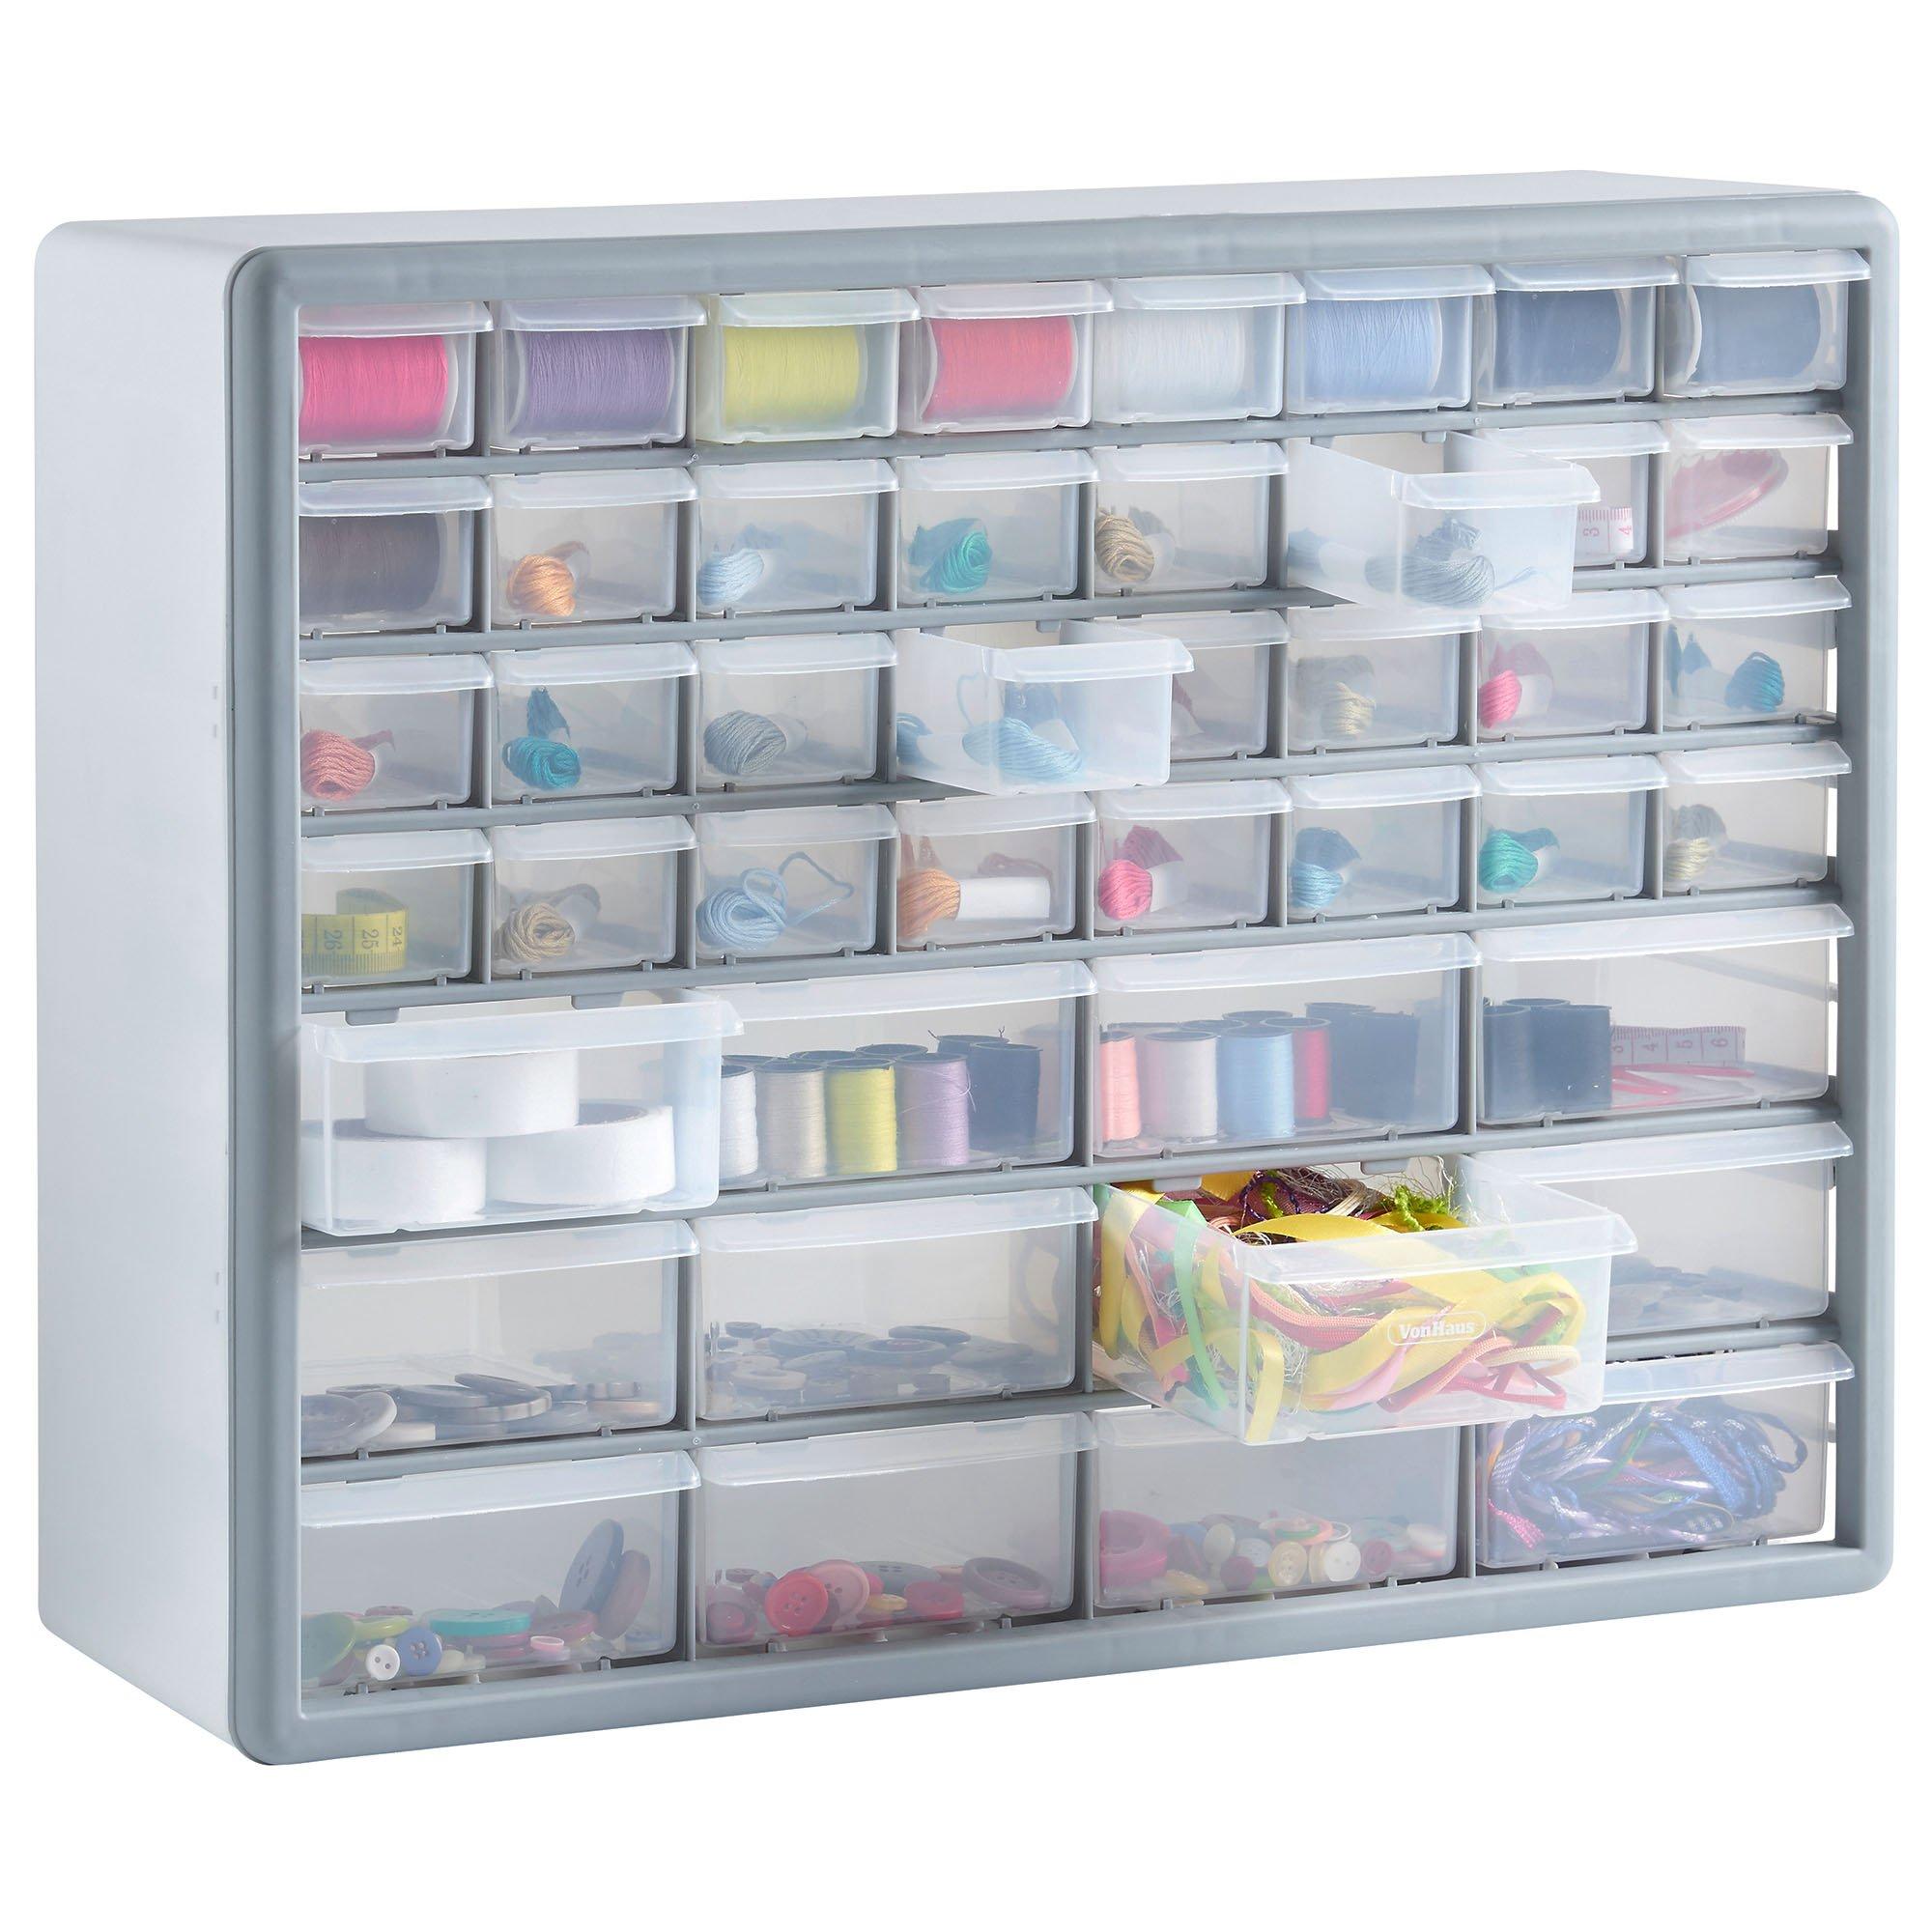 VonHaus 44 Multi Drawer Storage Cabinet Organiser - White/Grey  sc 1 st  Amazon UK & Craft Storage Units: Amazon.co.uk